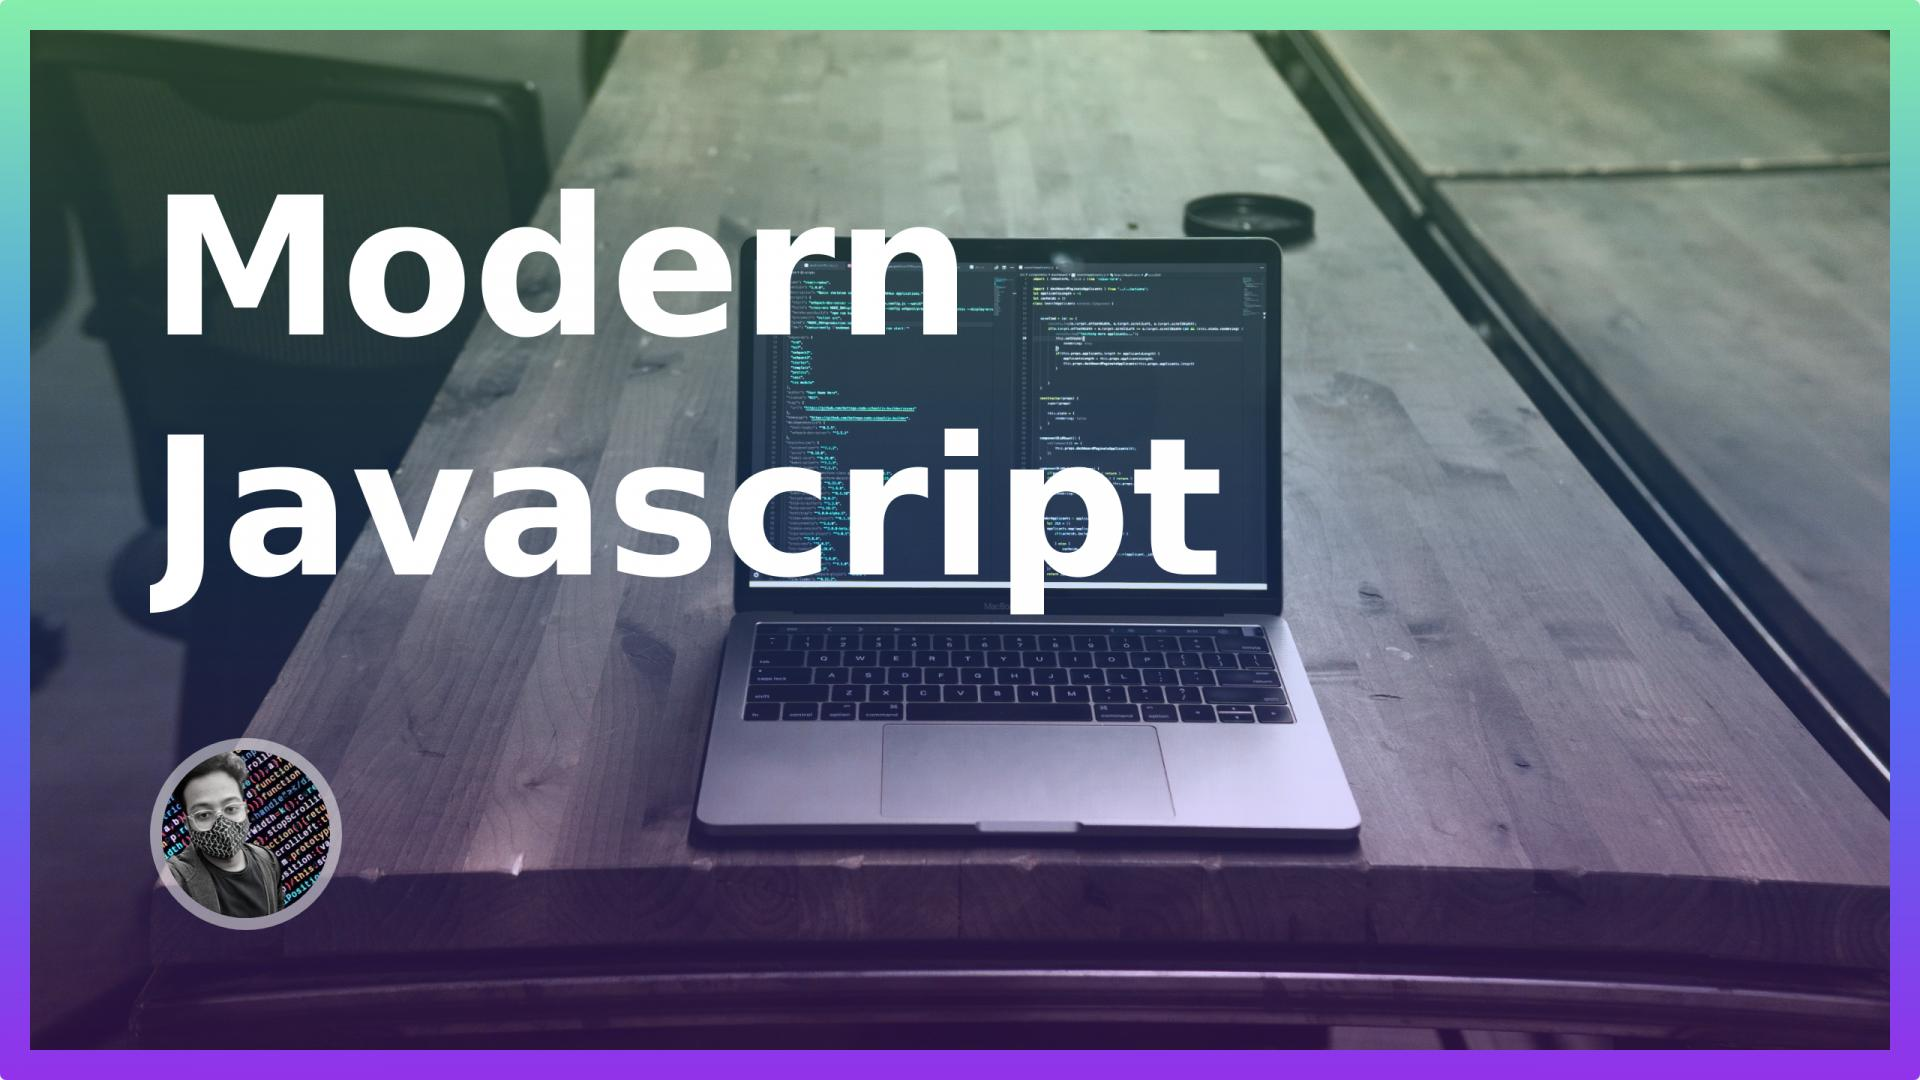 Modern Javascript - I